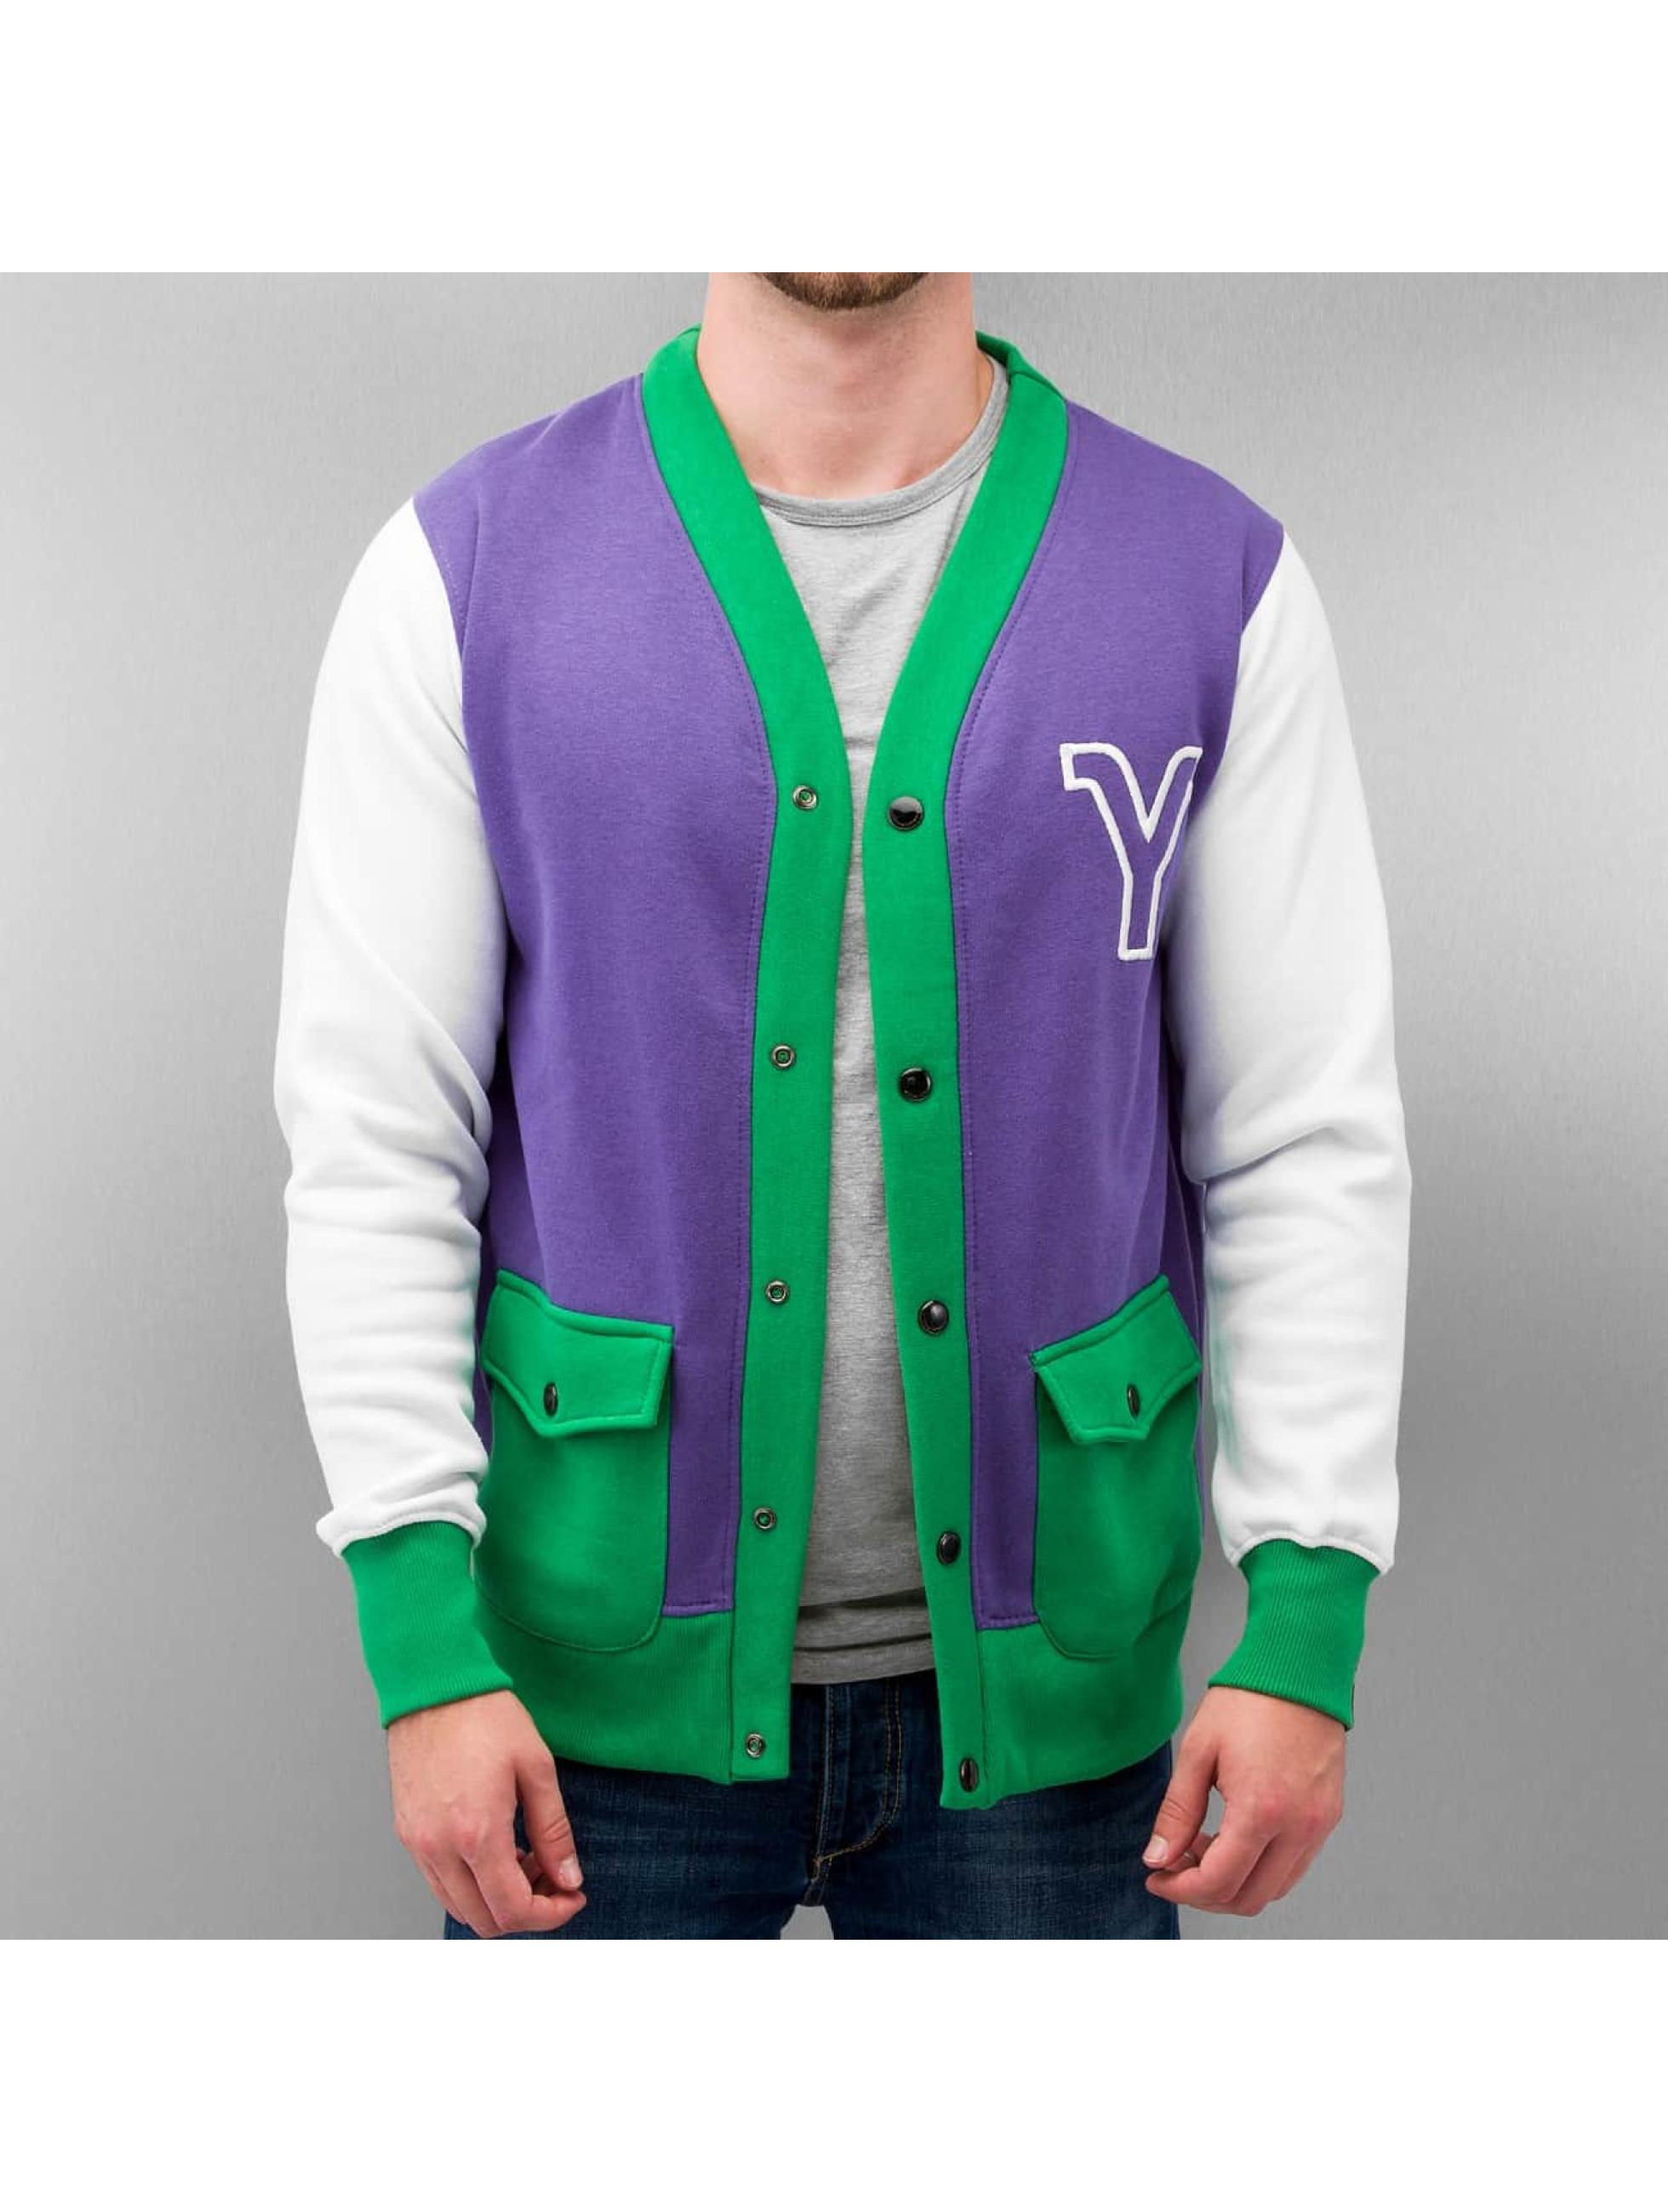 Yezz Männer College Jacke Manana in violet